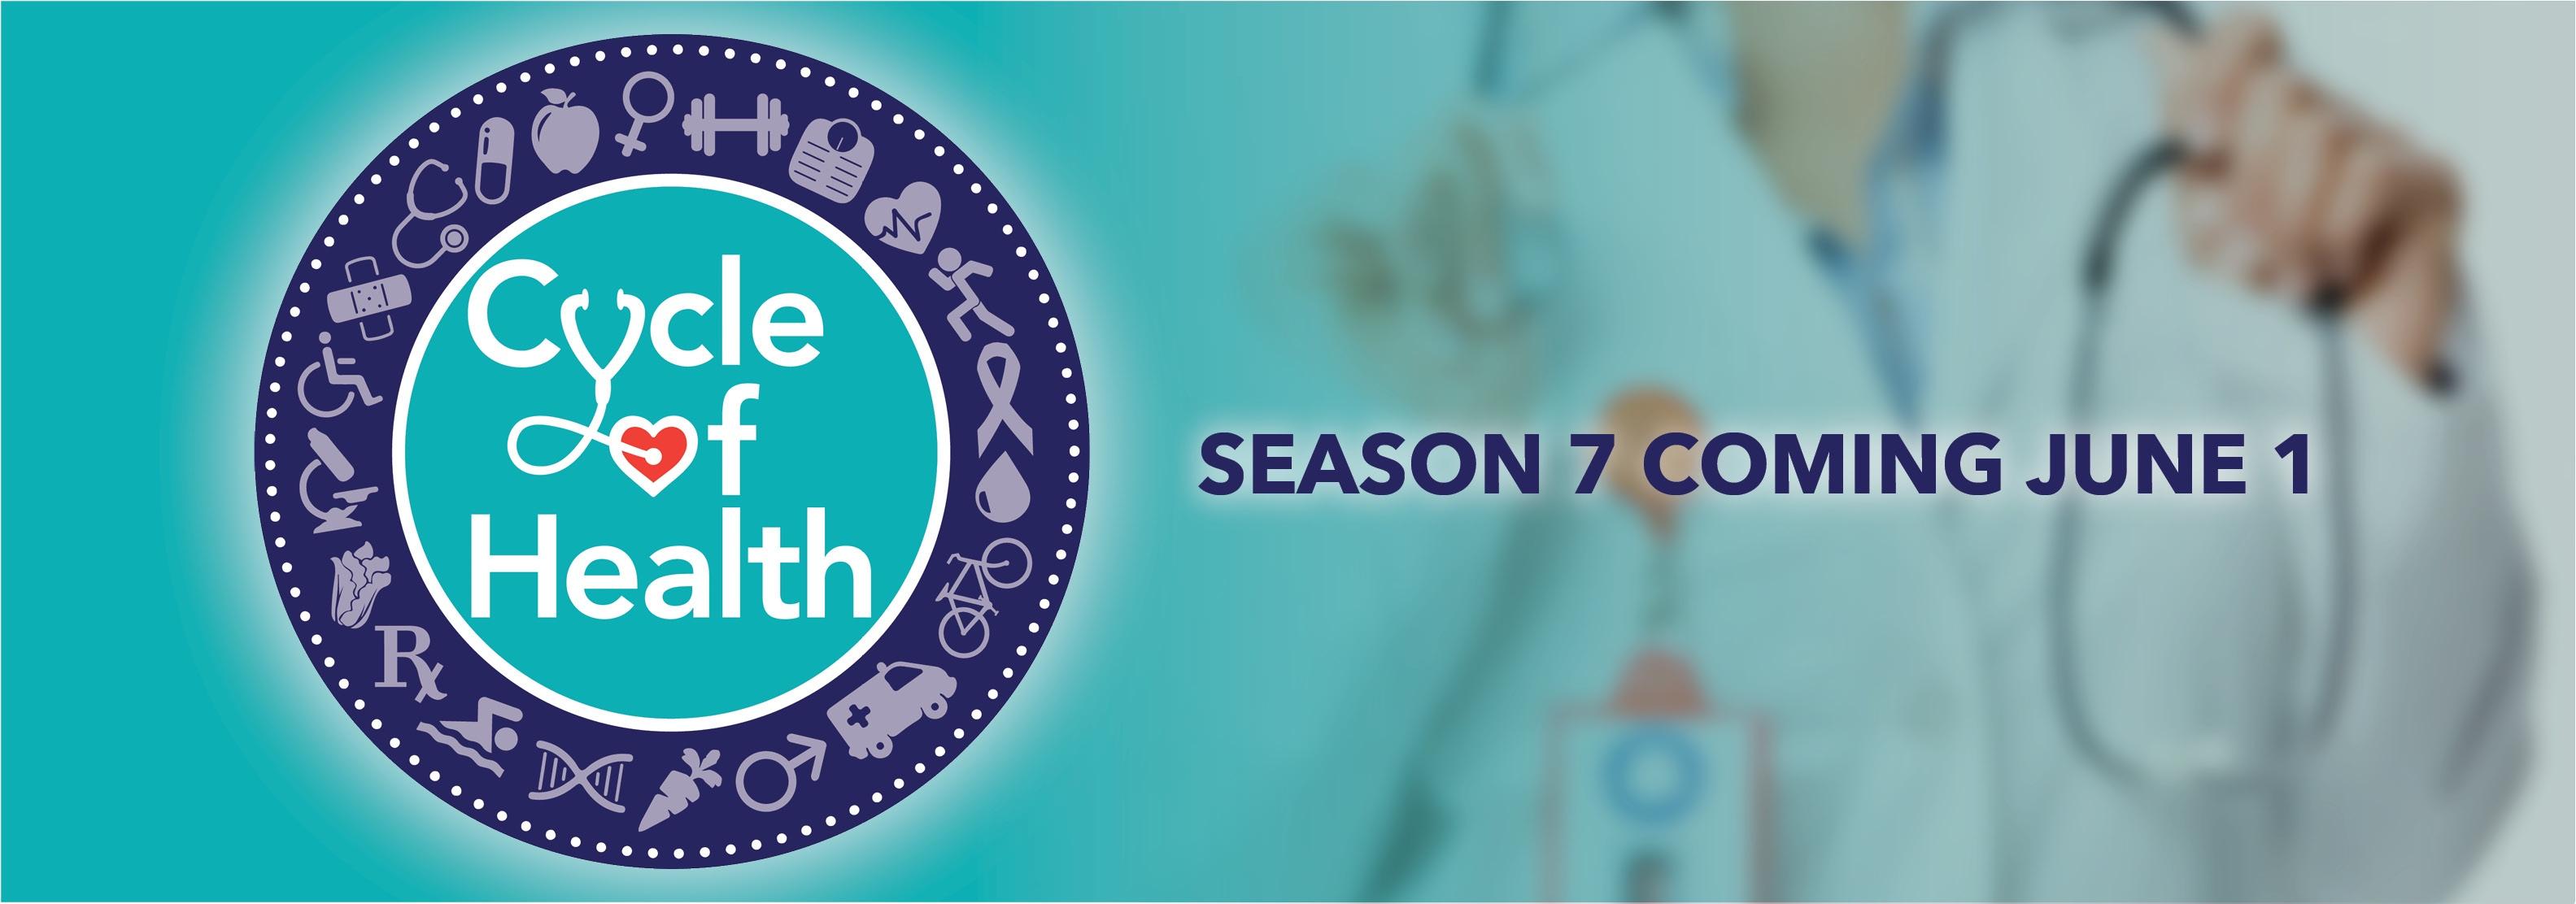 COH season 7 coming soon2